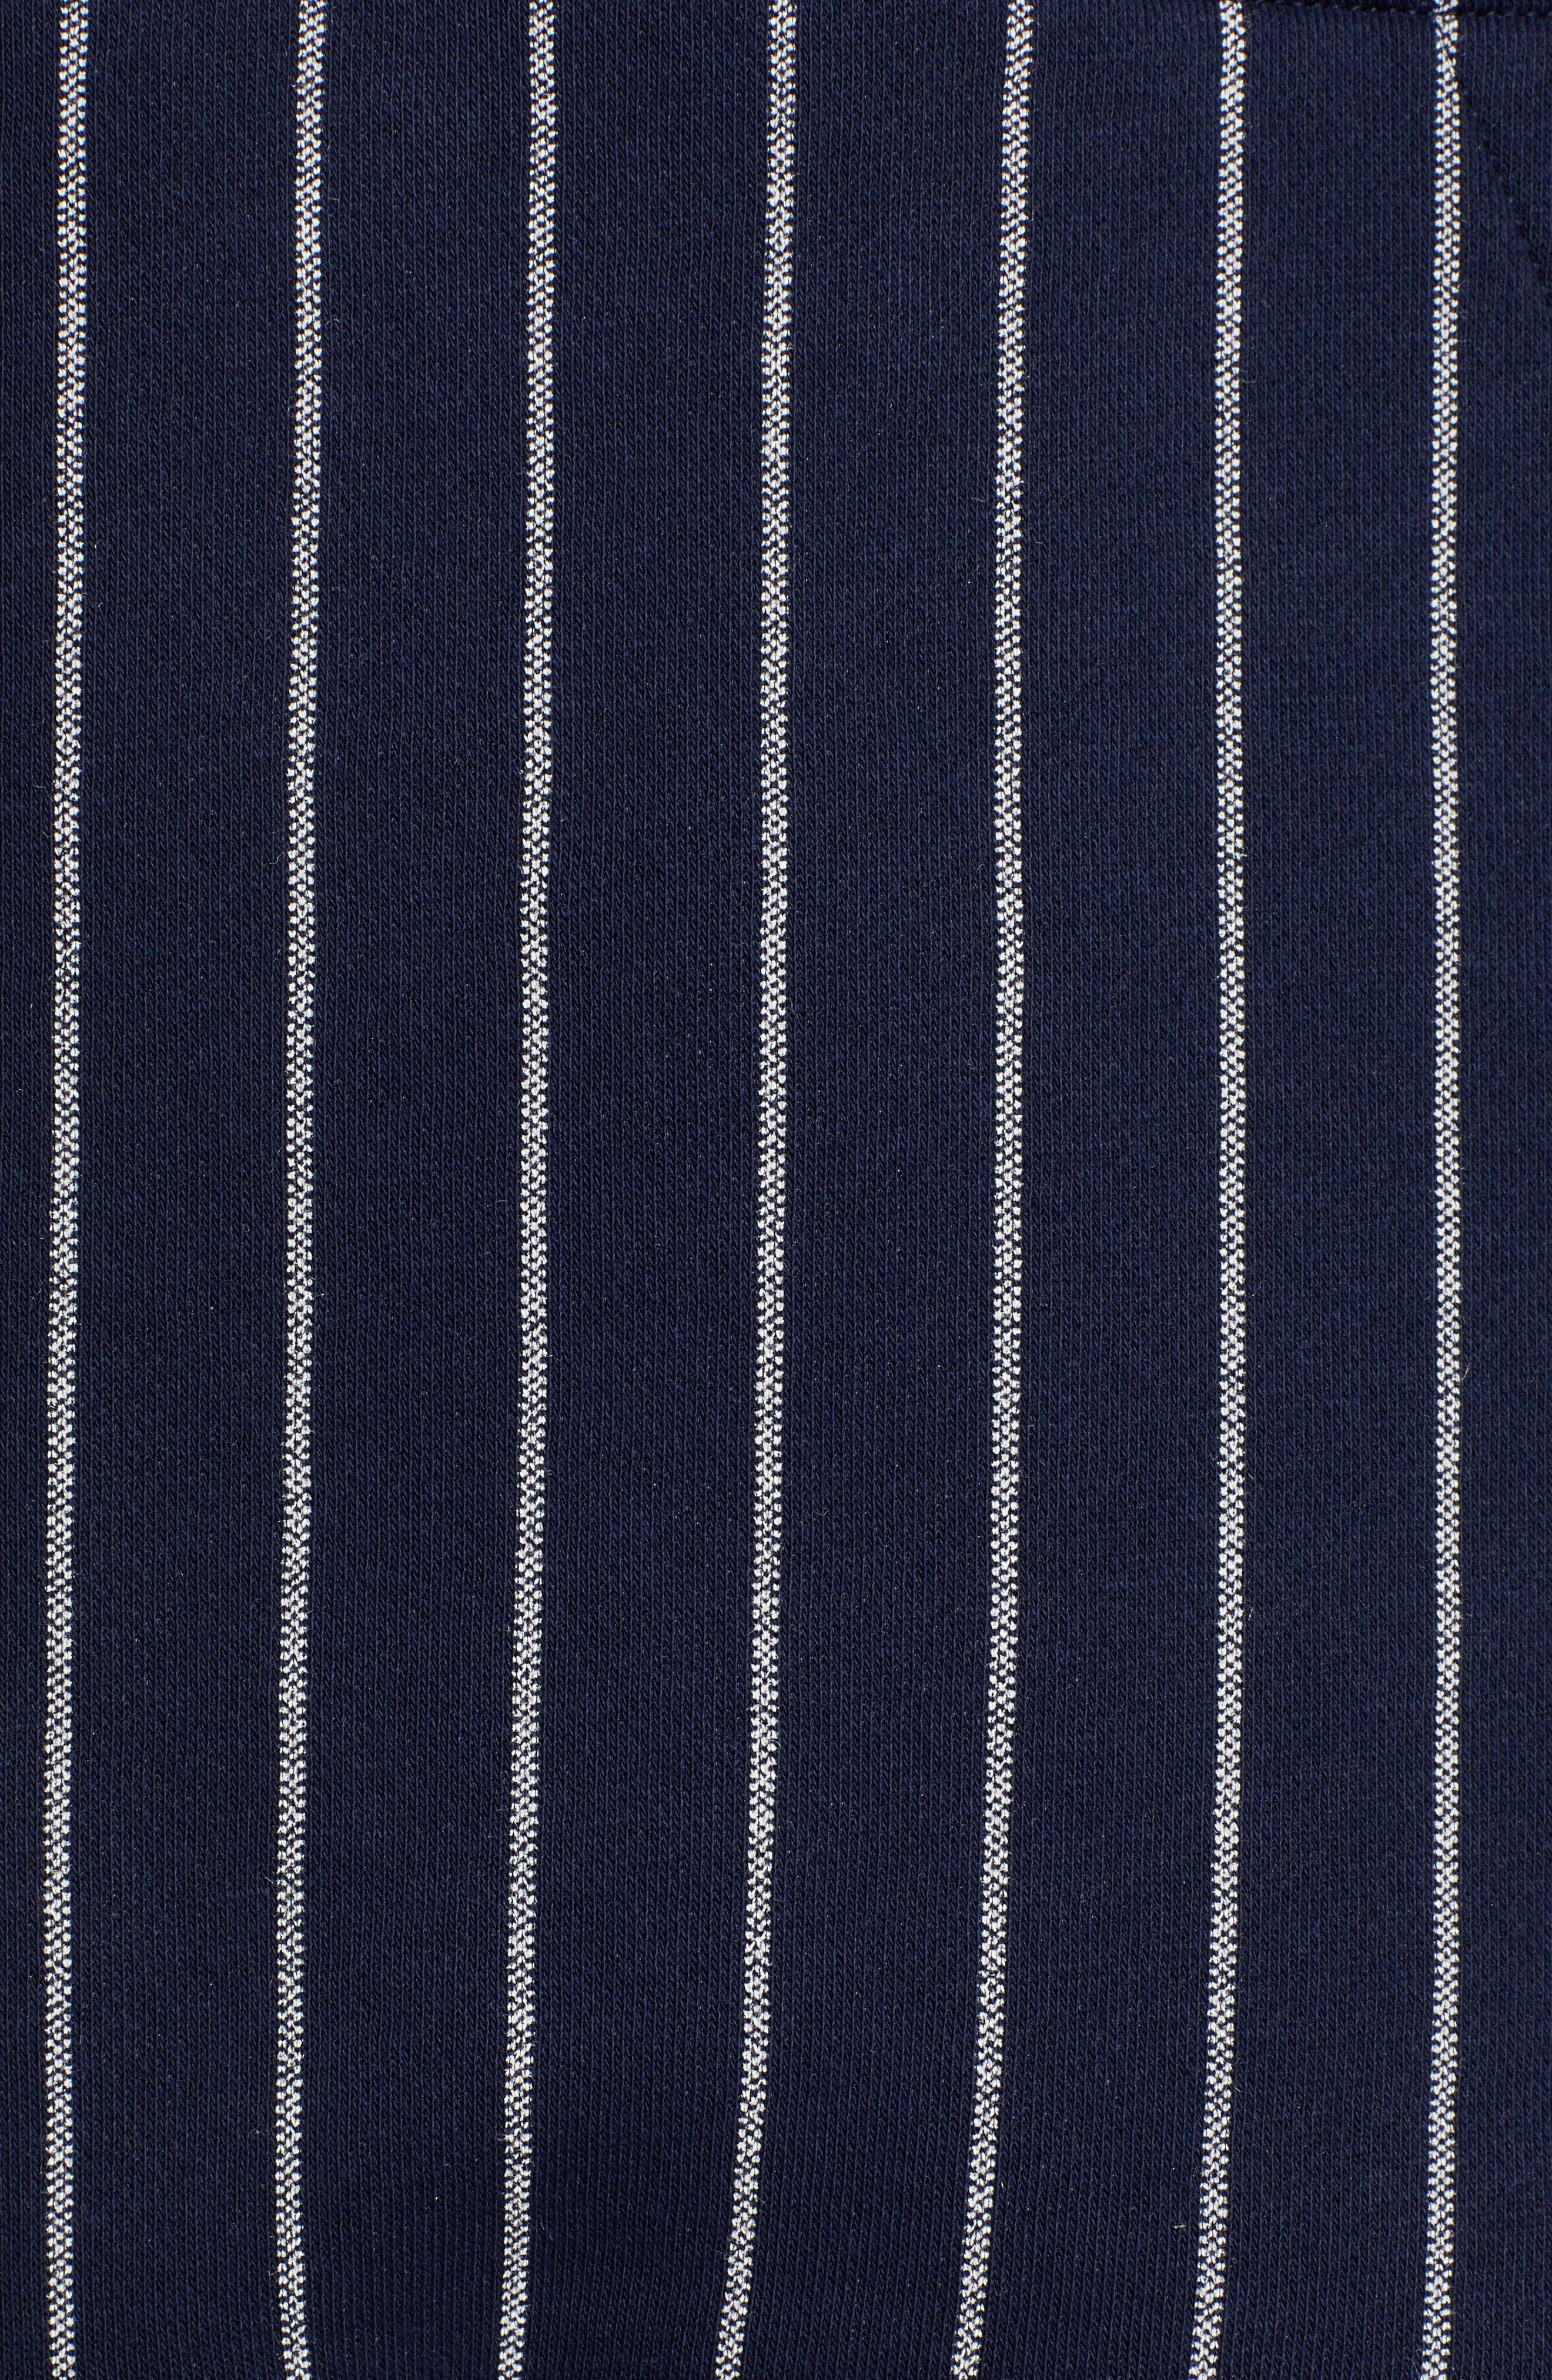 UOTF Core Pintstripe Hoodie,                             Alternate thumbnail 5, color,                             SARTHO BLUE/ MILK